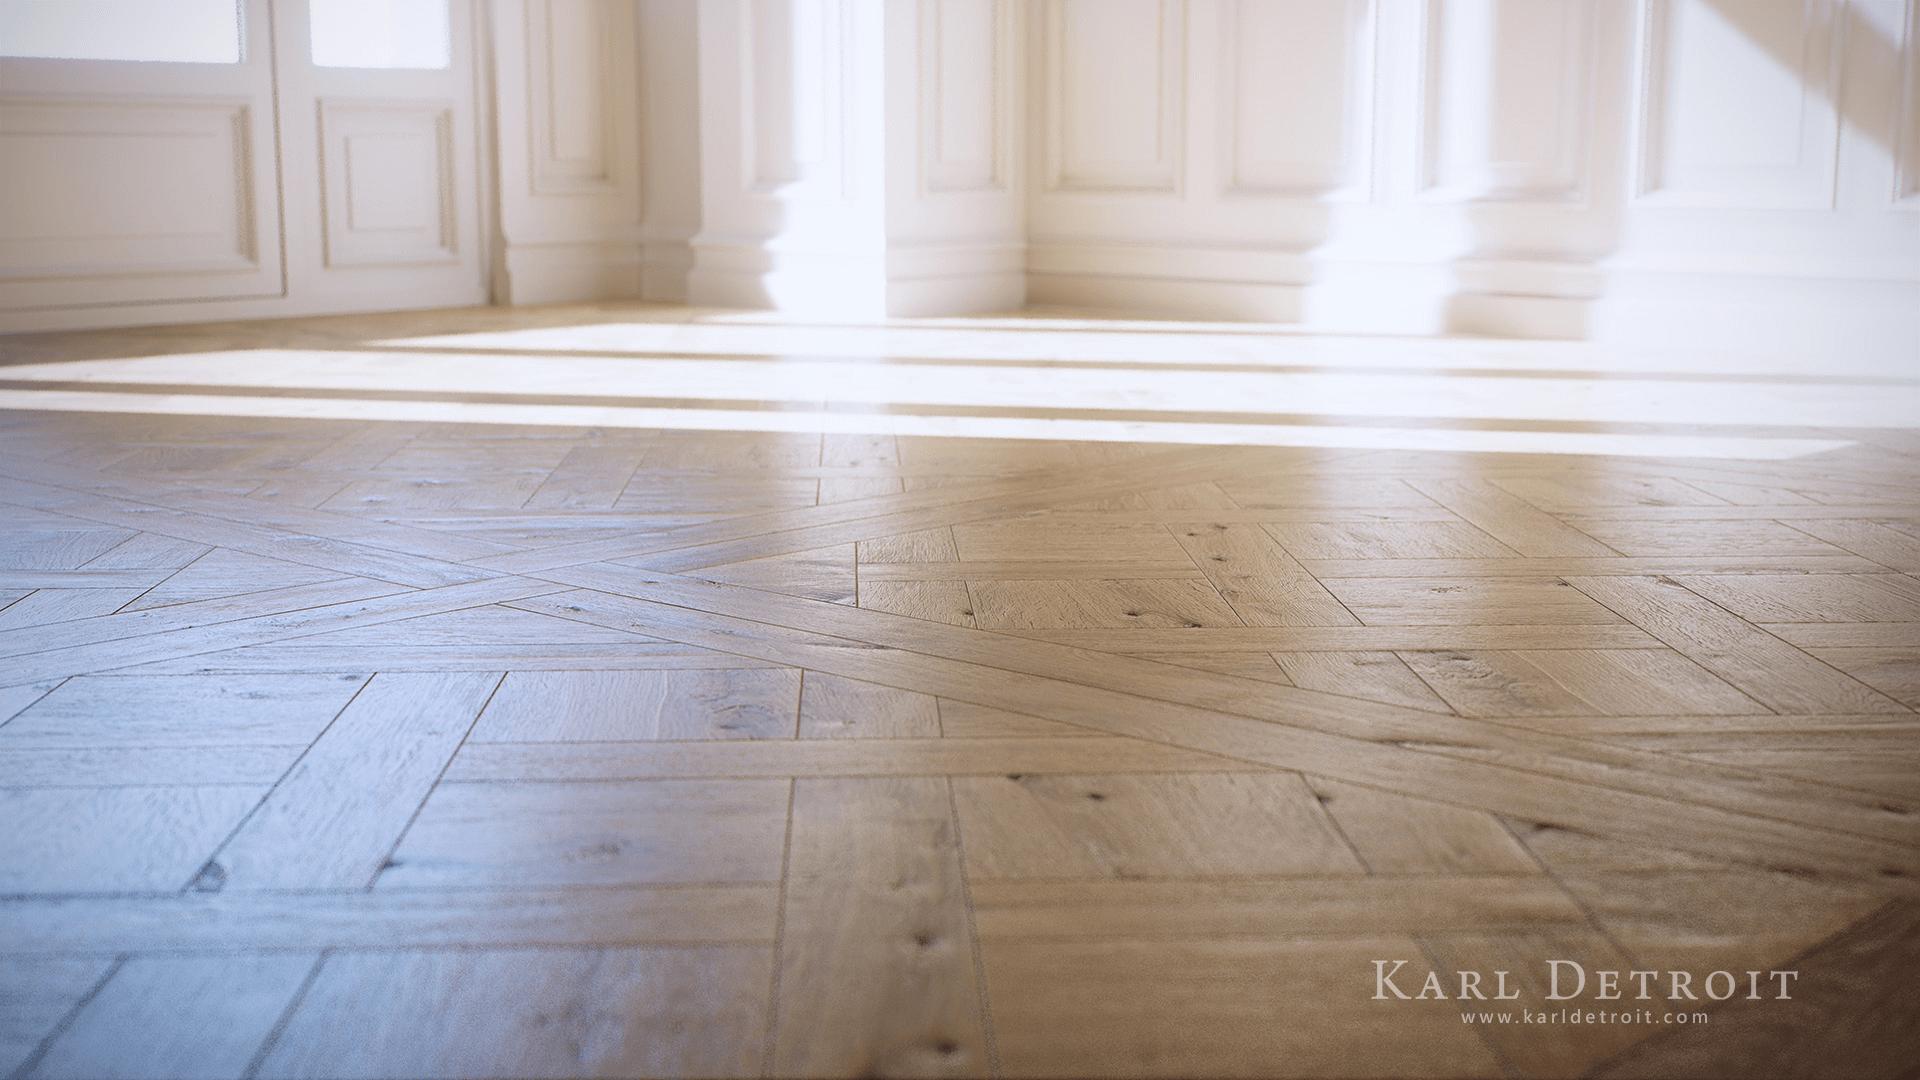 4k materials wood flooring by karl detroit in for Flooring materials